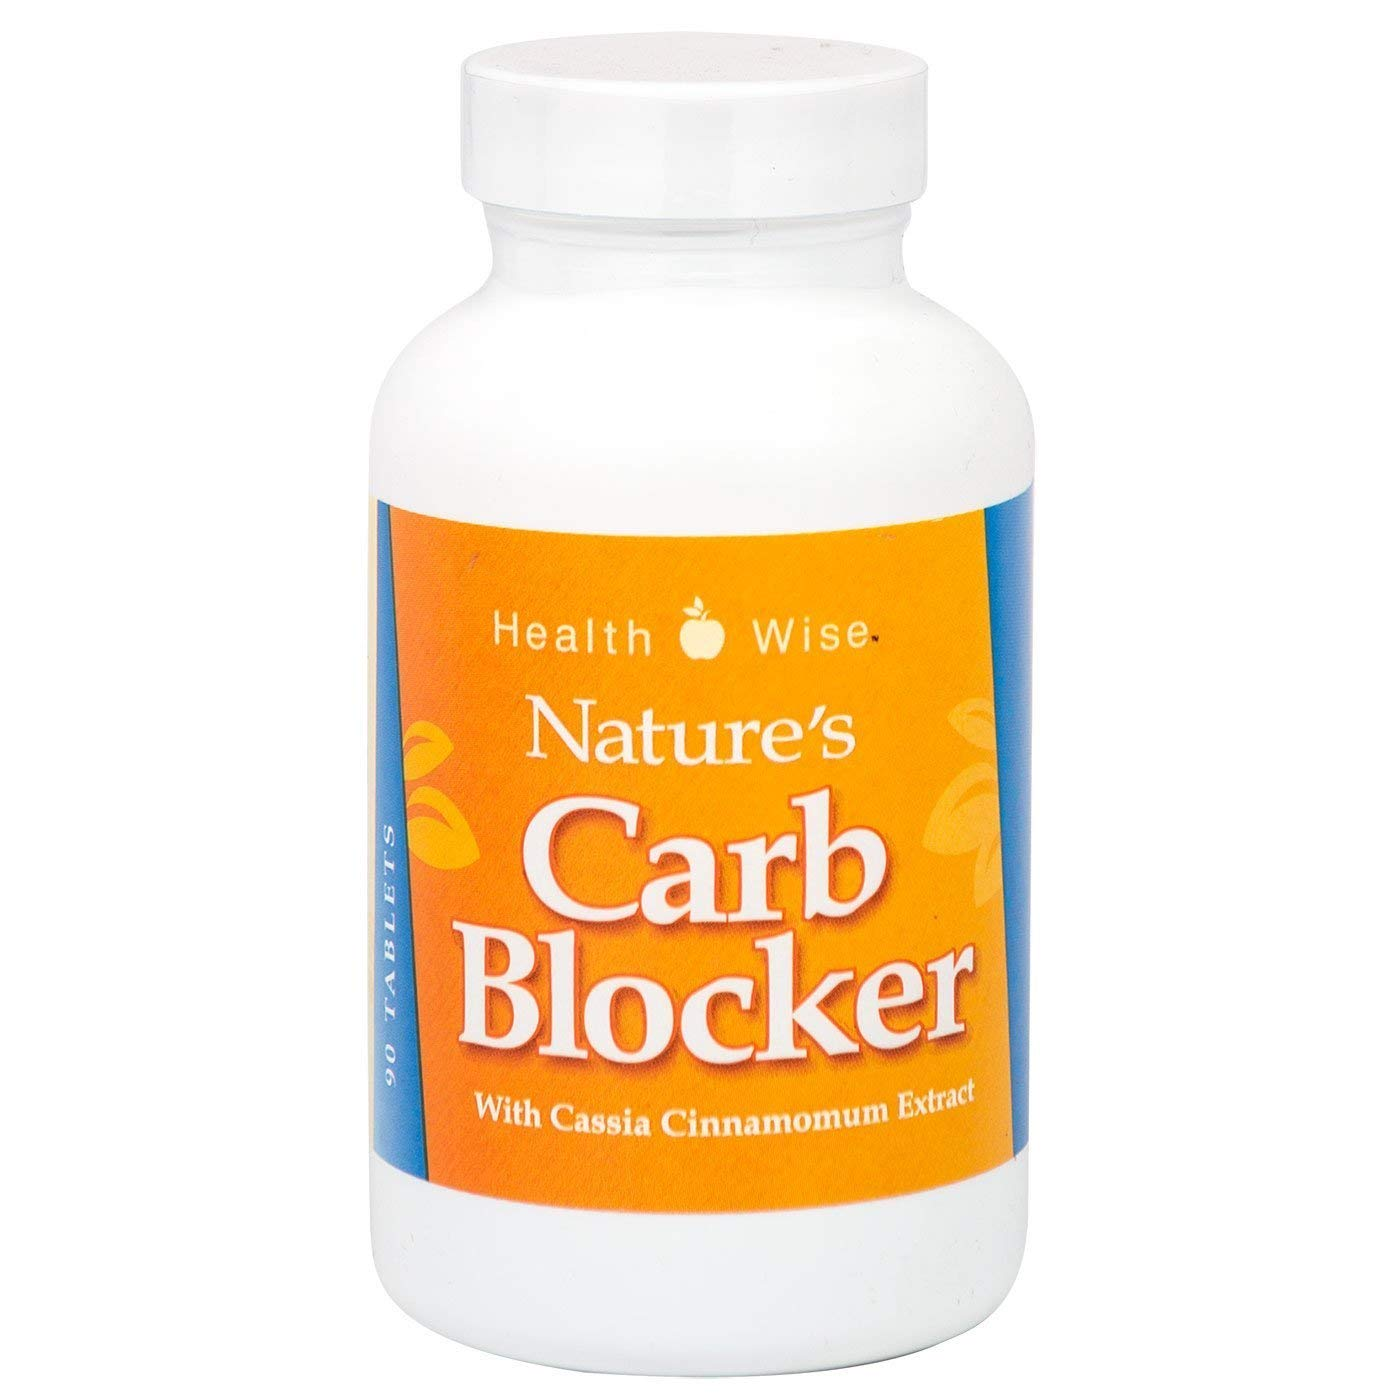 HealthSmart Supplement - Nature's Carb Blocker - Diet Supplement - Starch Neutralizer - Natural Ingredients - 90 Tablets